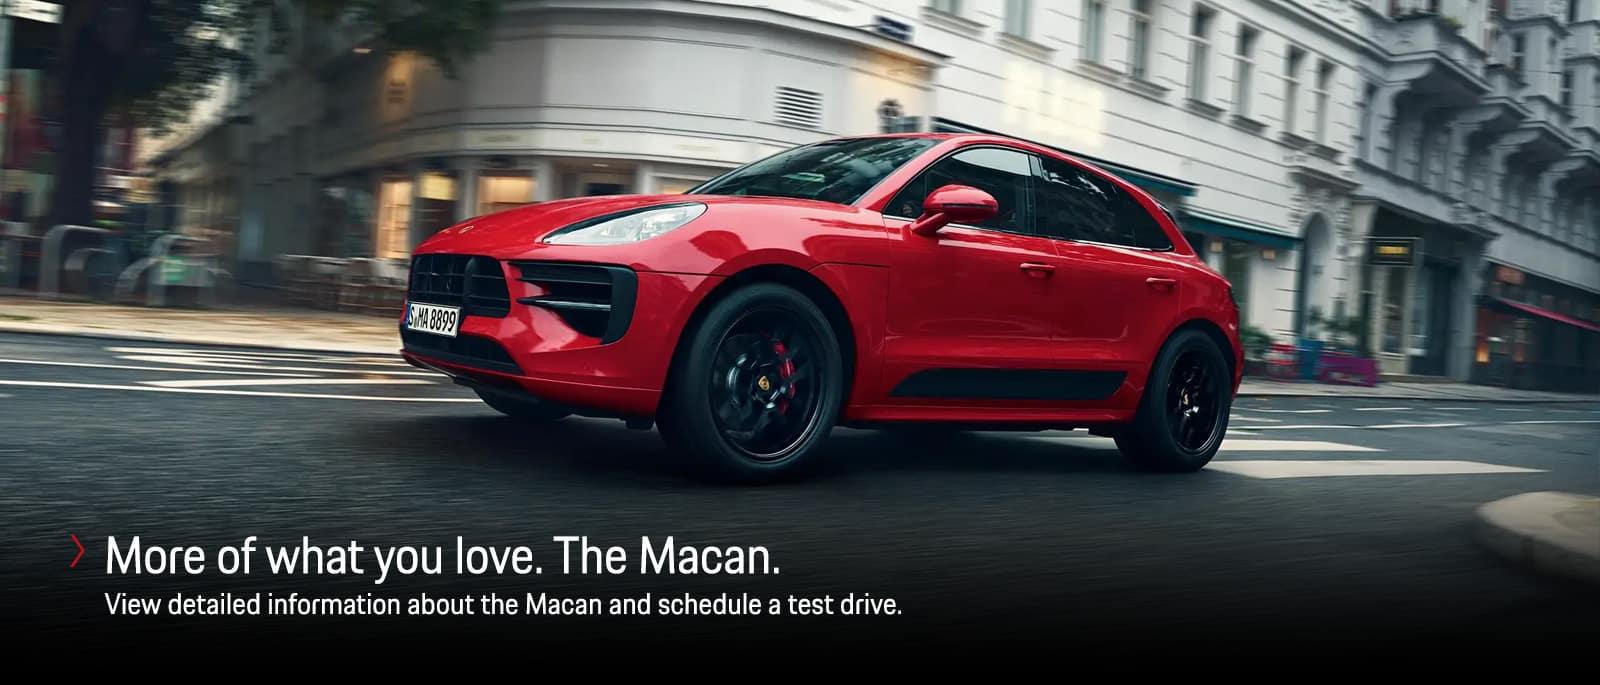 Porsche Macan Information